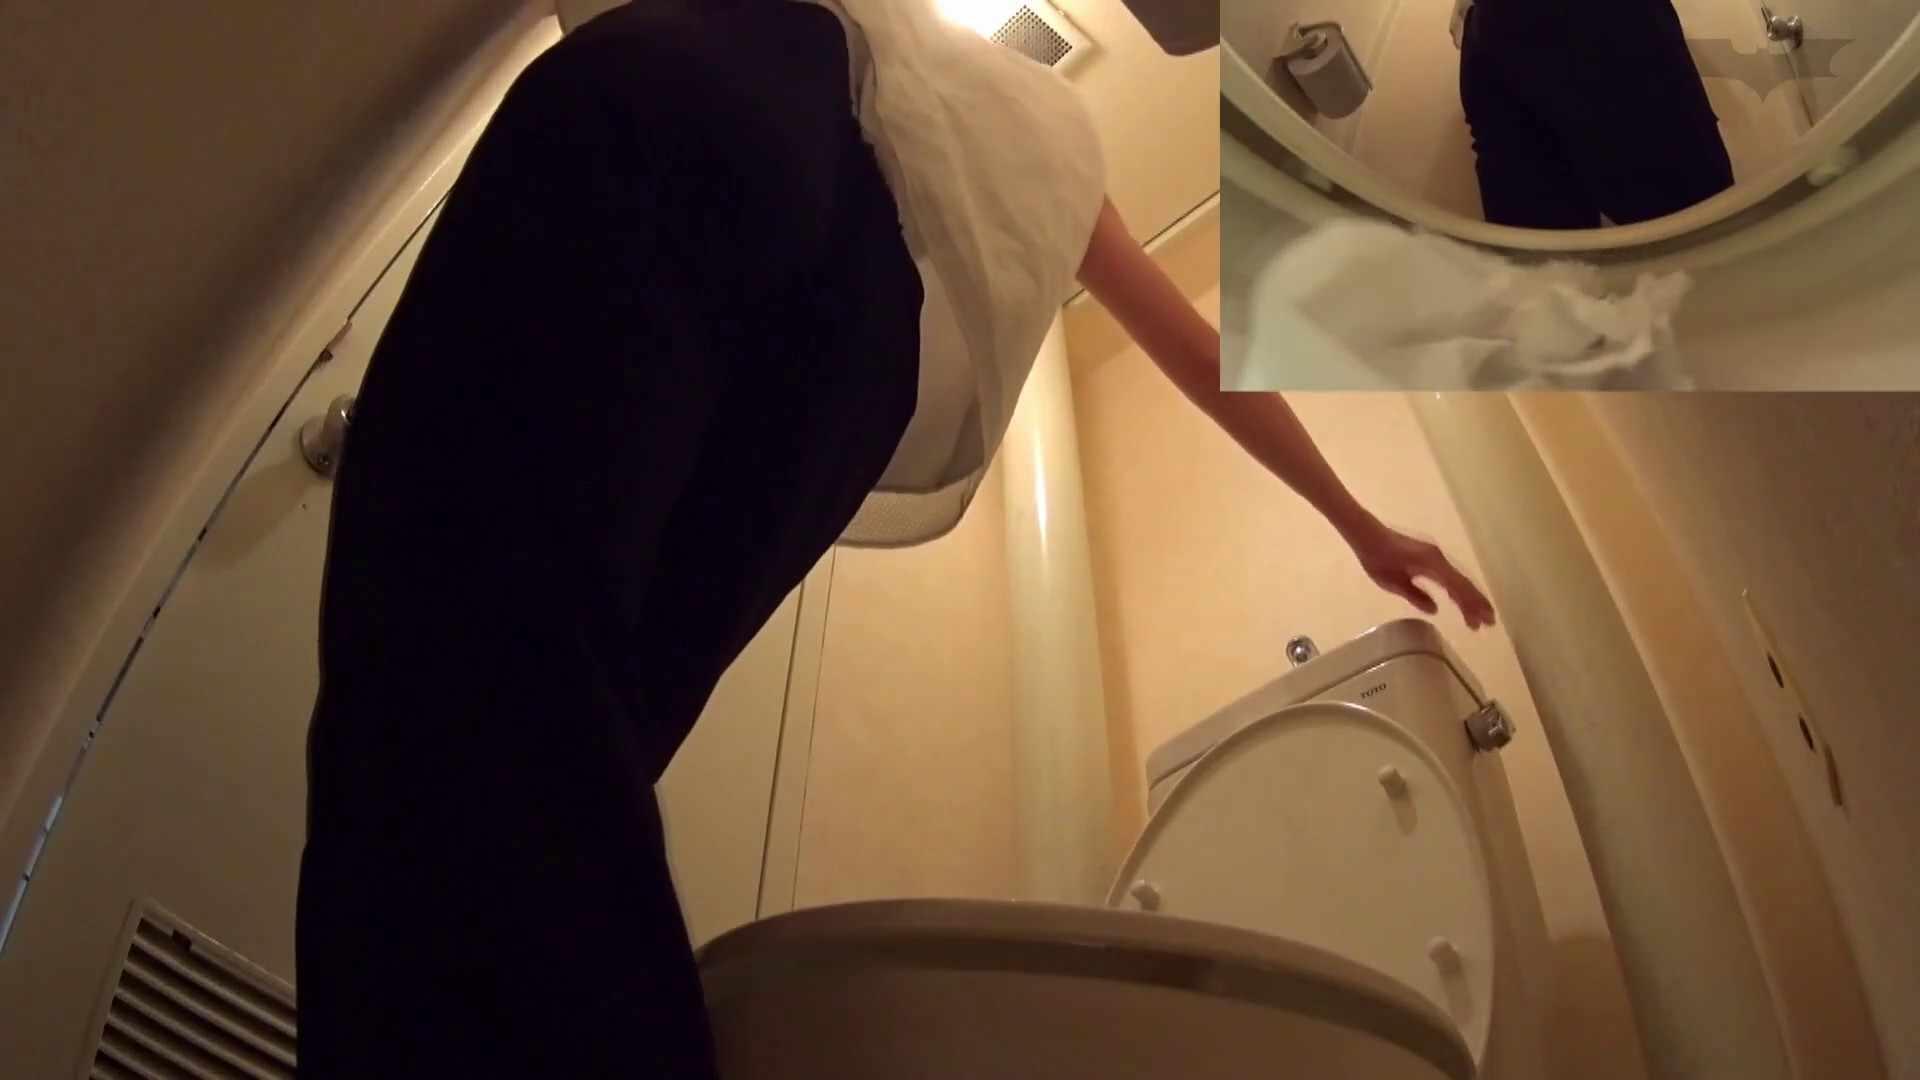 vol.04[洗面所]実はコレが目的でした。-脱糞美人お女市さまと巨乳大学生- 洗面所 AV動画キャプチャ 104画像 52